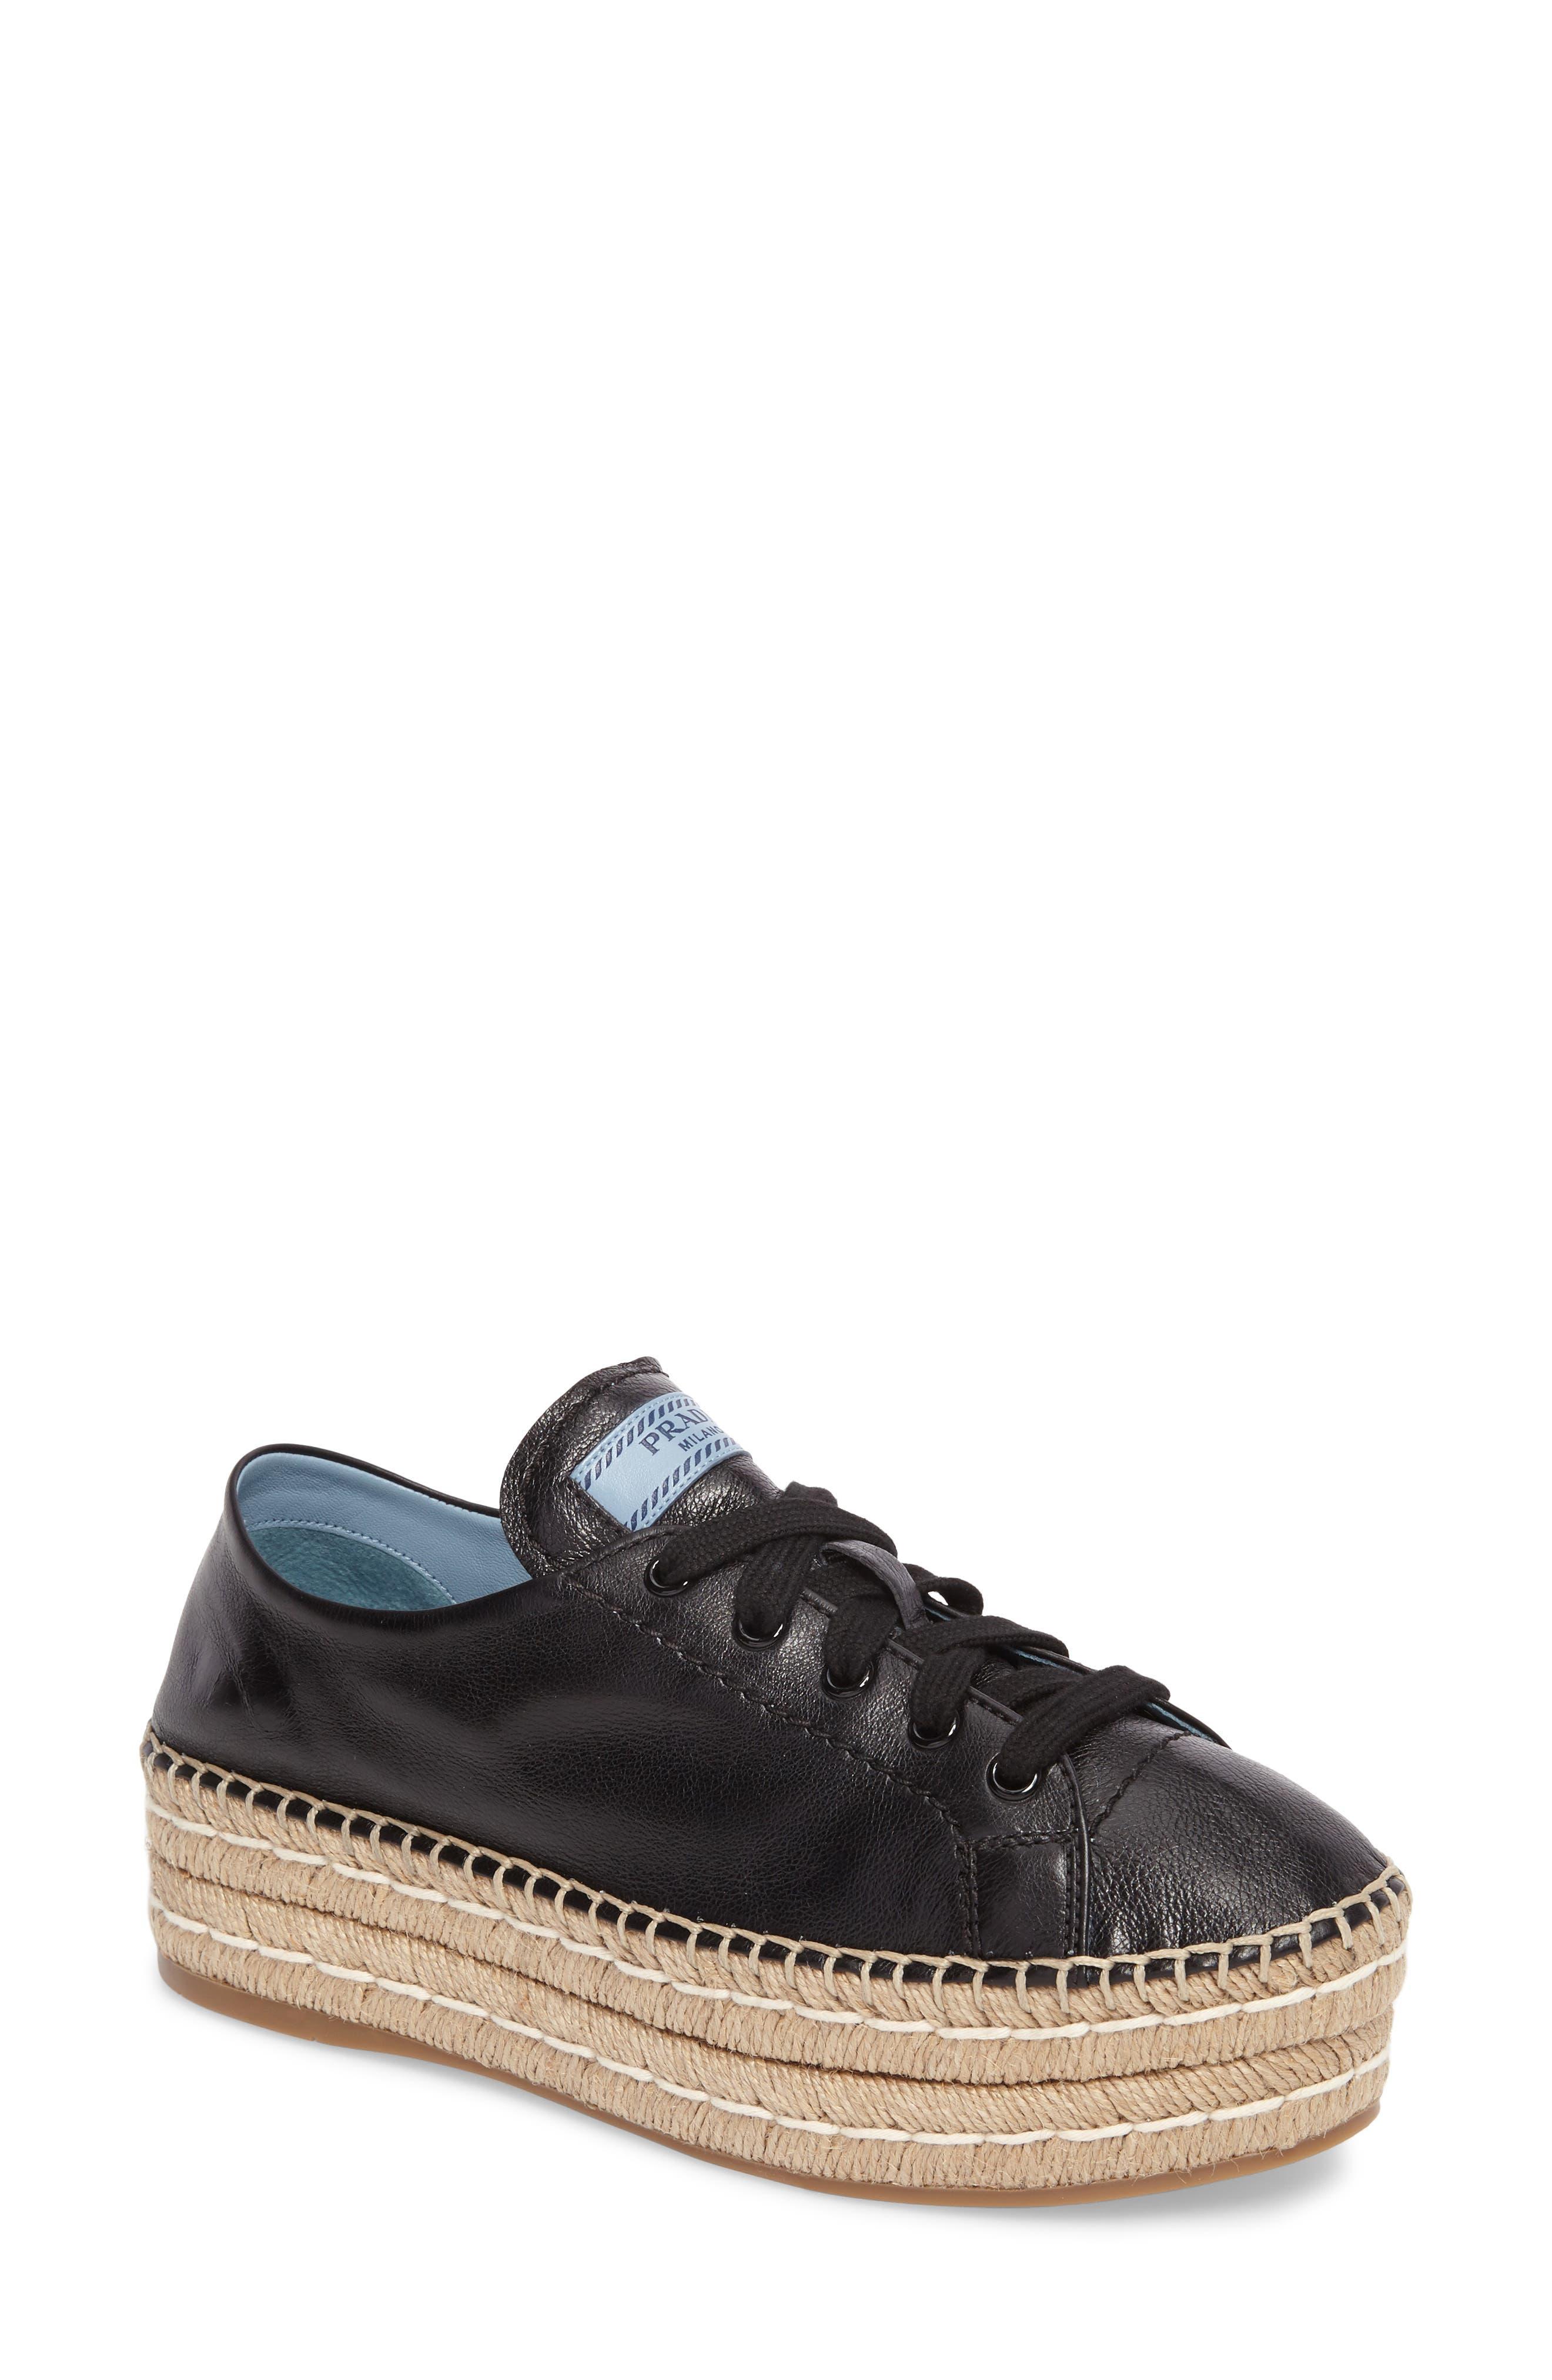 Flatform Espadrille Sneaker,                             Main thumbnail 1, color,                             Black